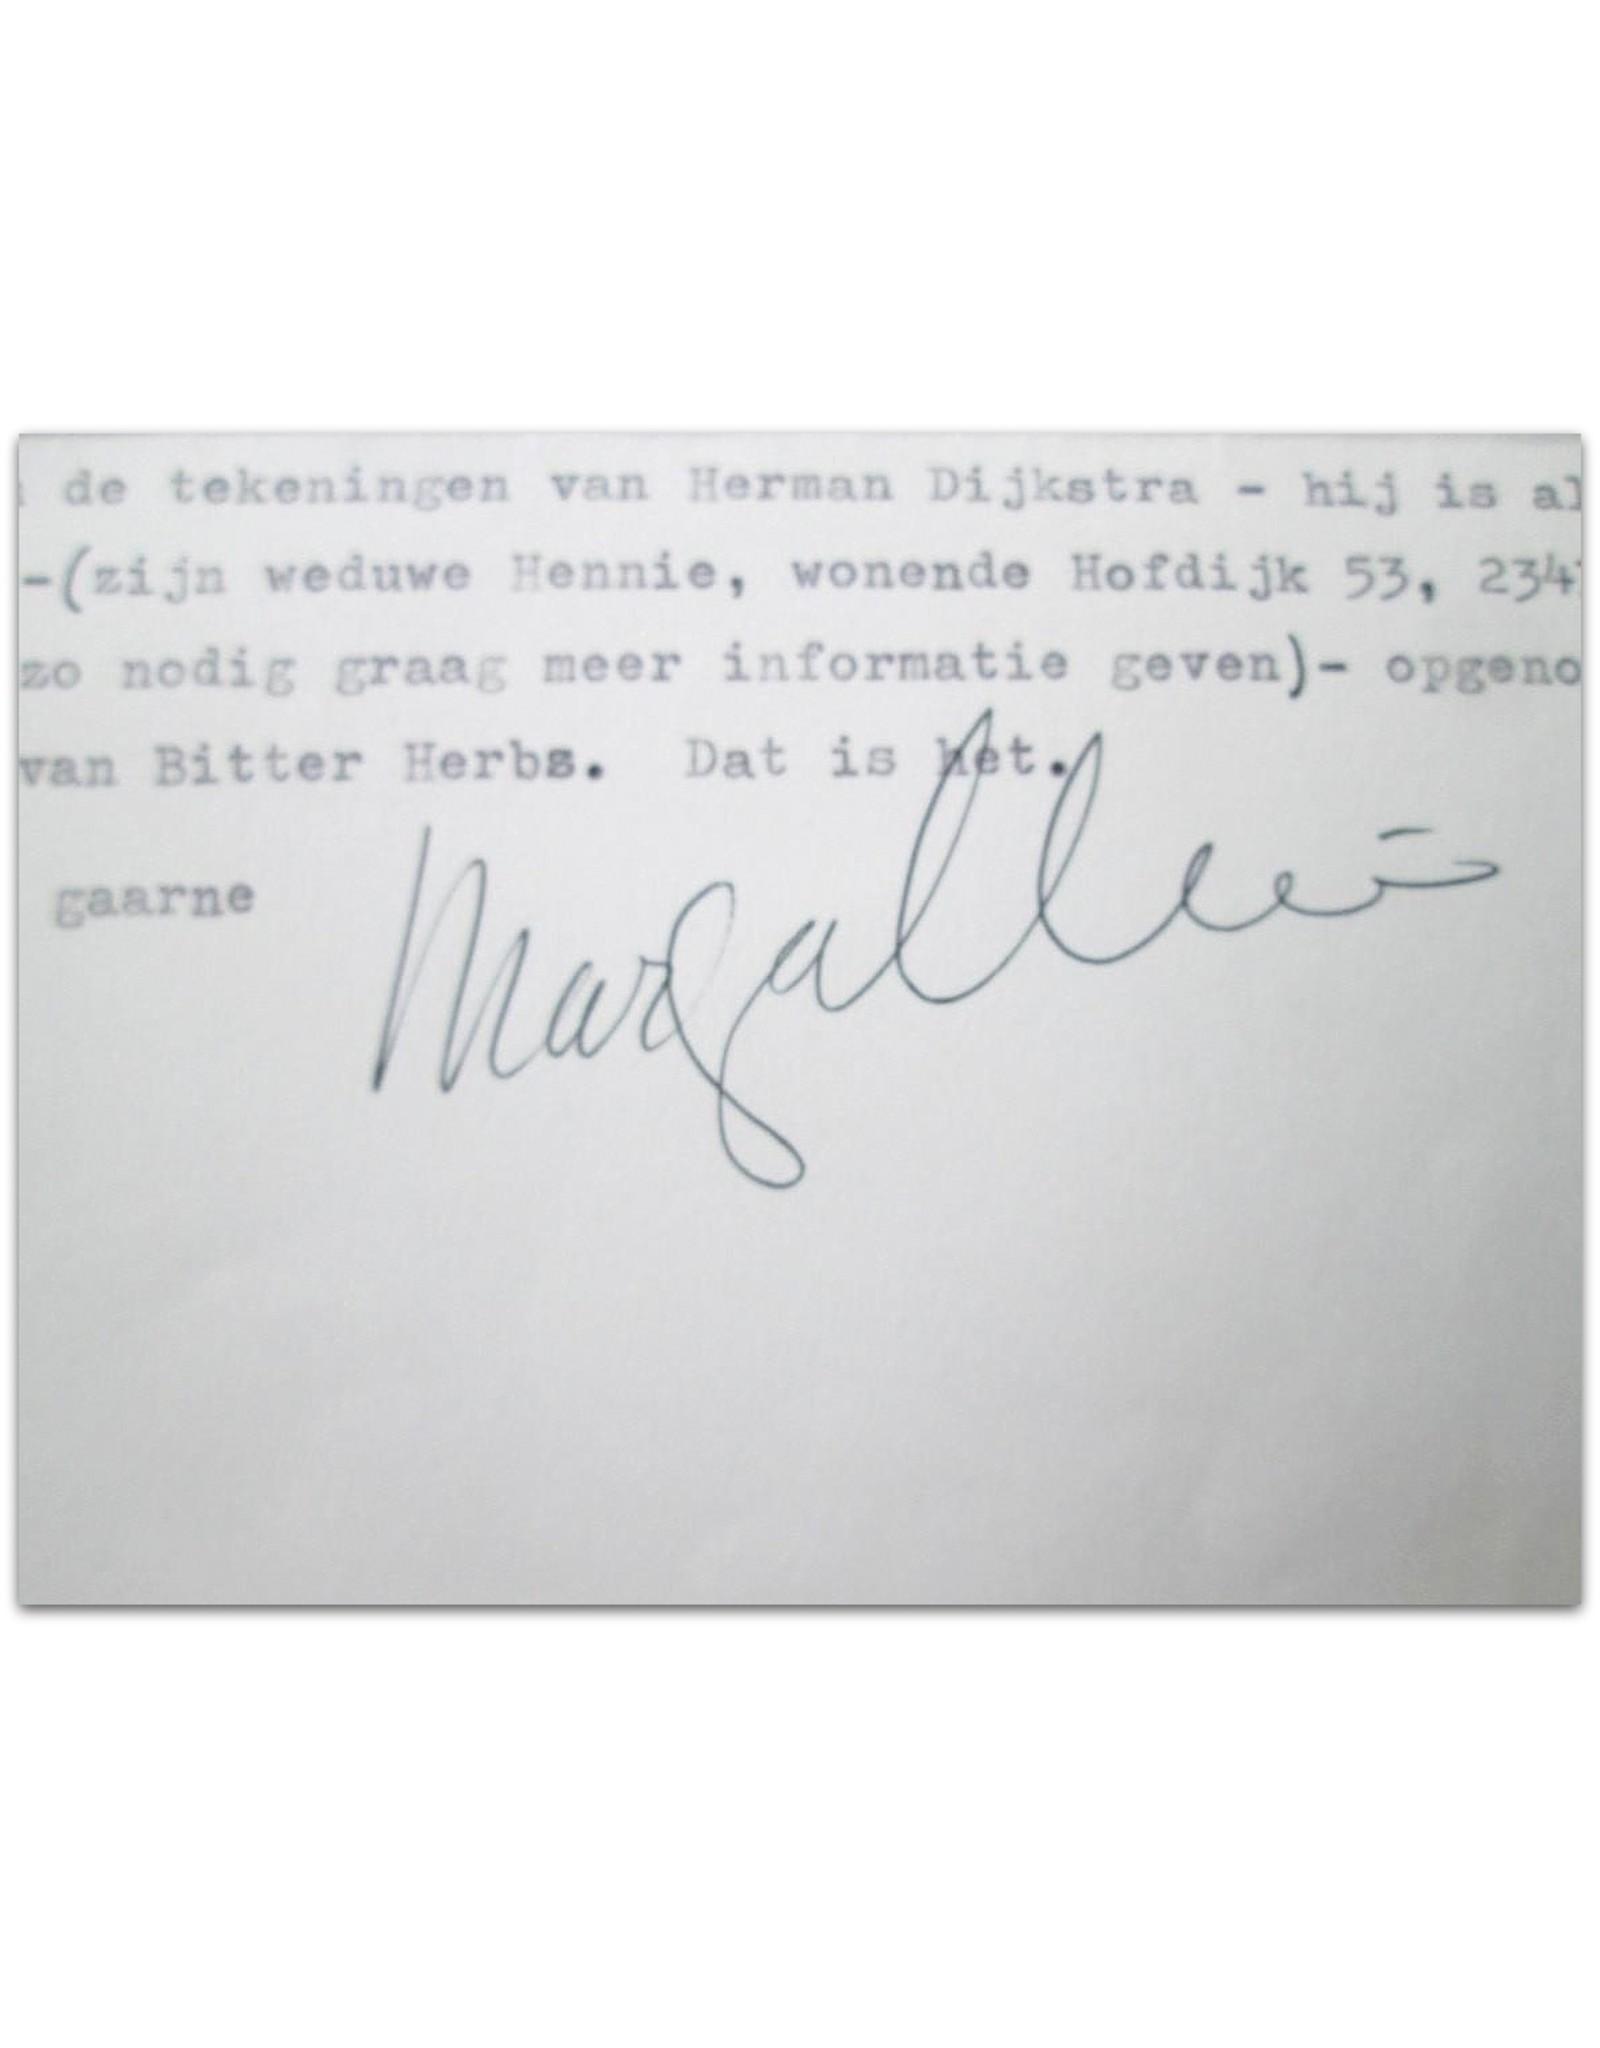 Marga Minco - Geachte heer Aerts,  [Original letter in typescript]